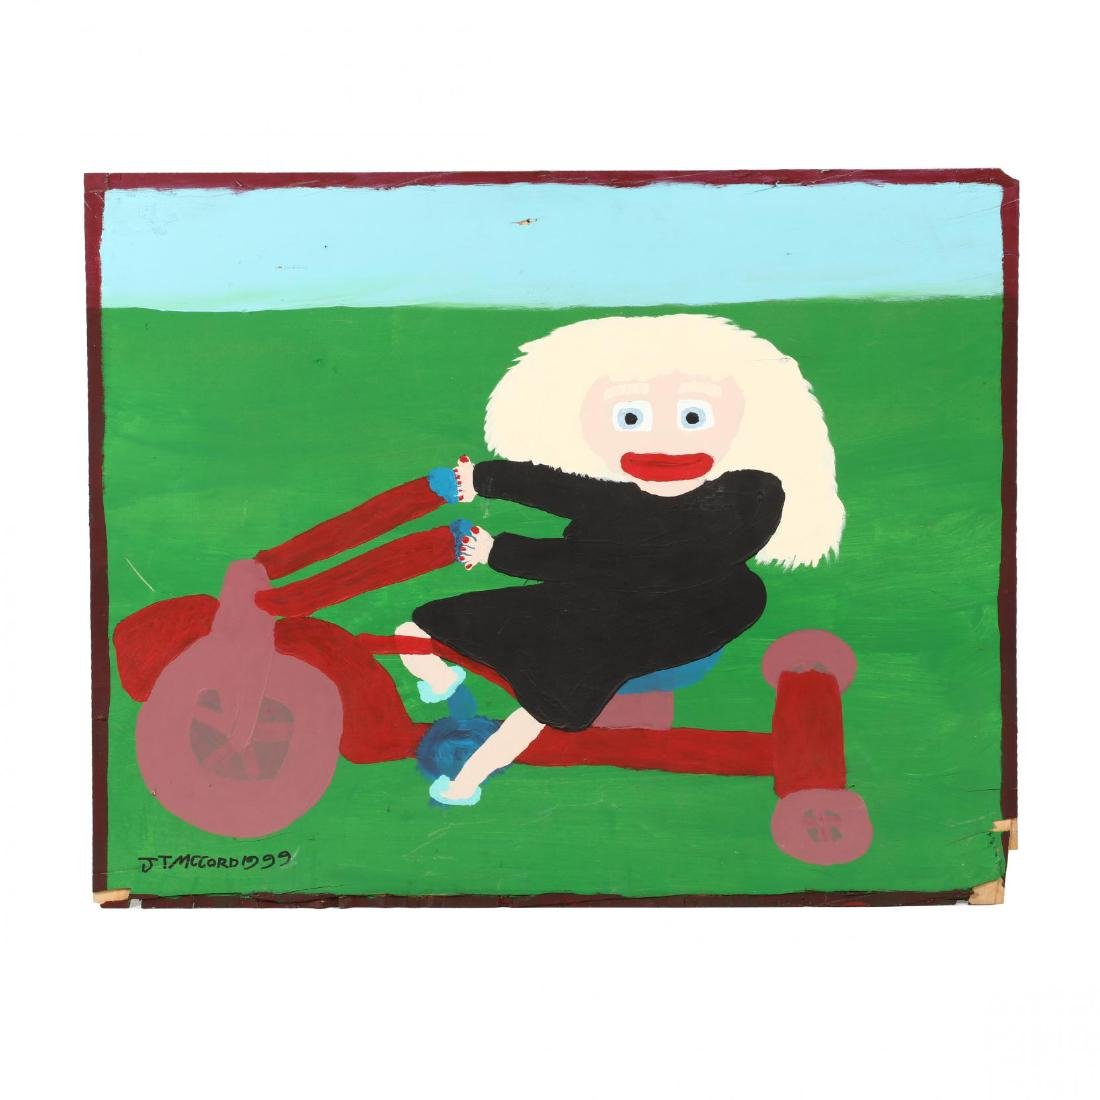 Jake McCord (GA, 1948-2009), Girl on Tricycle